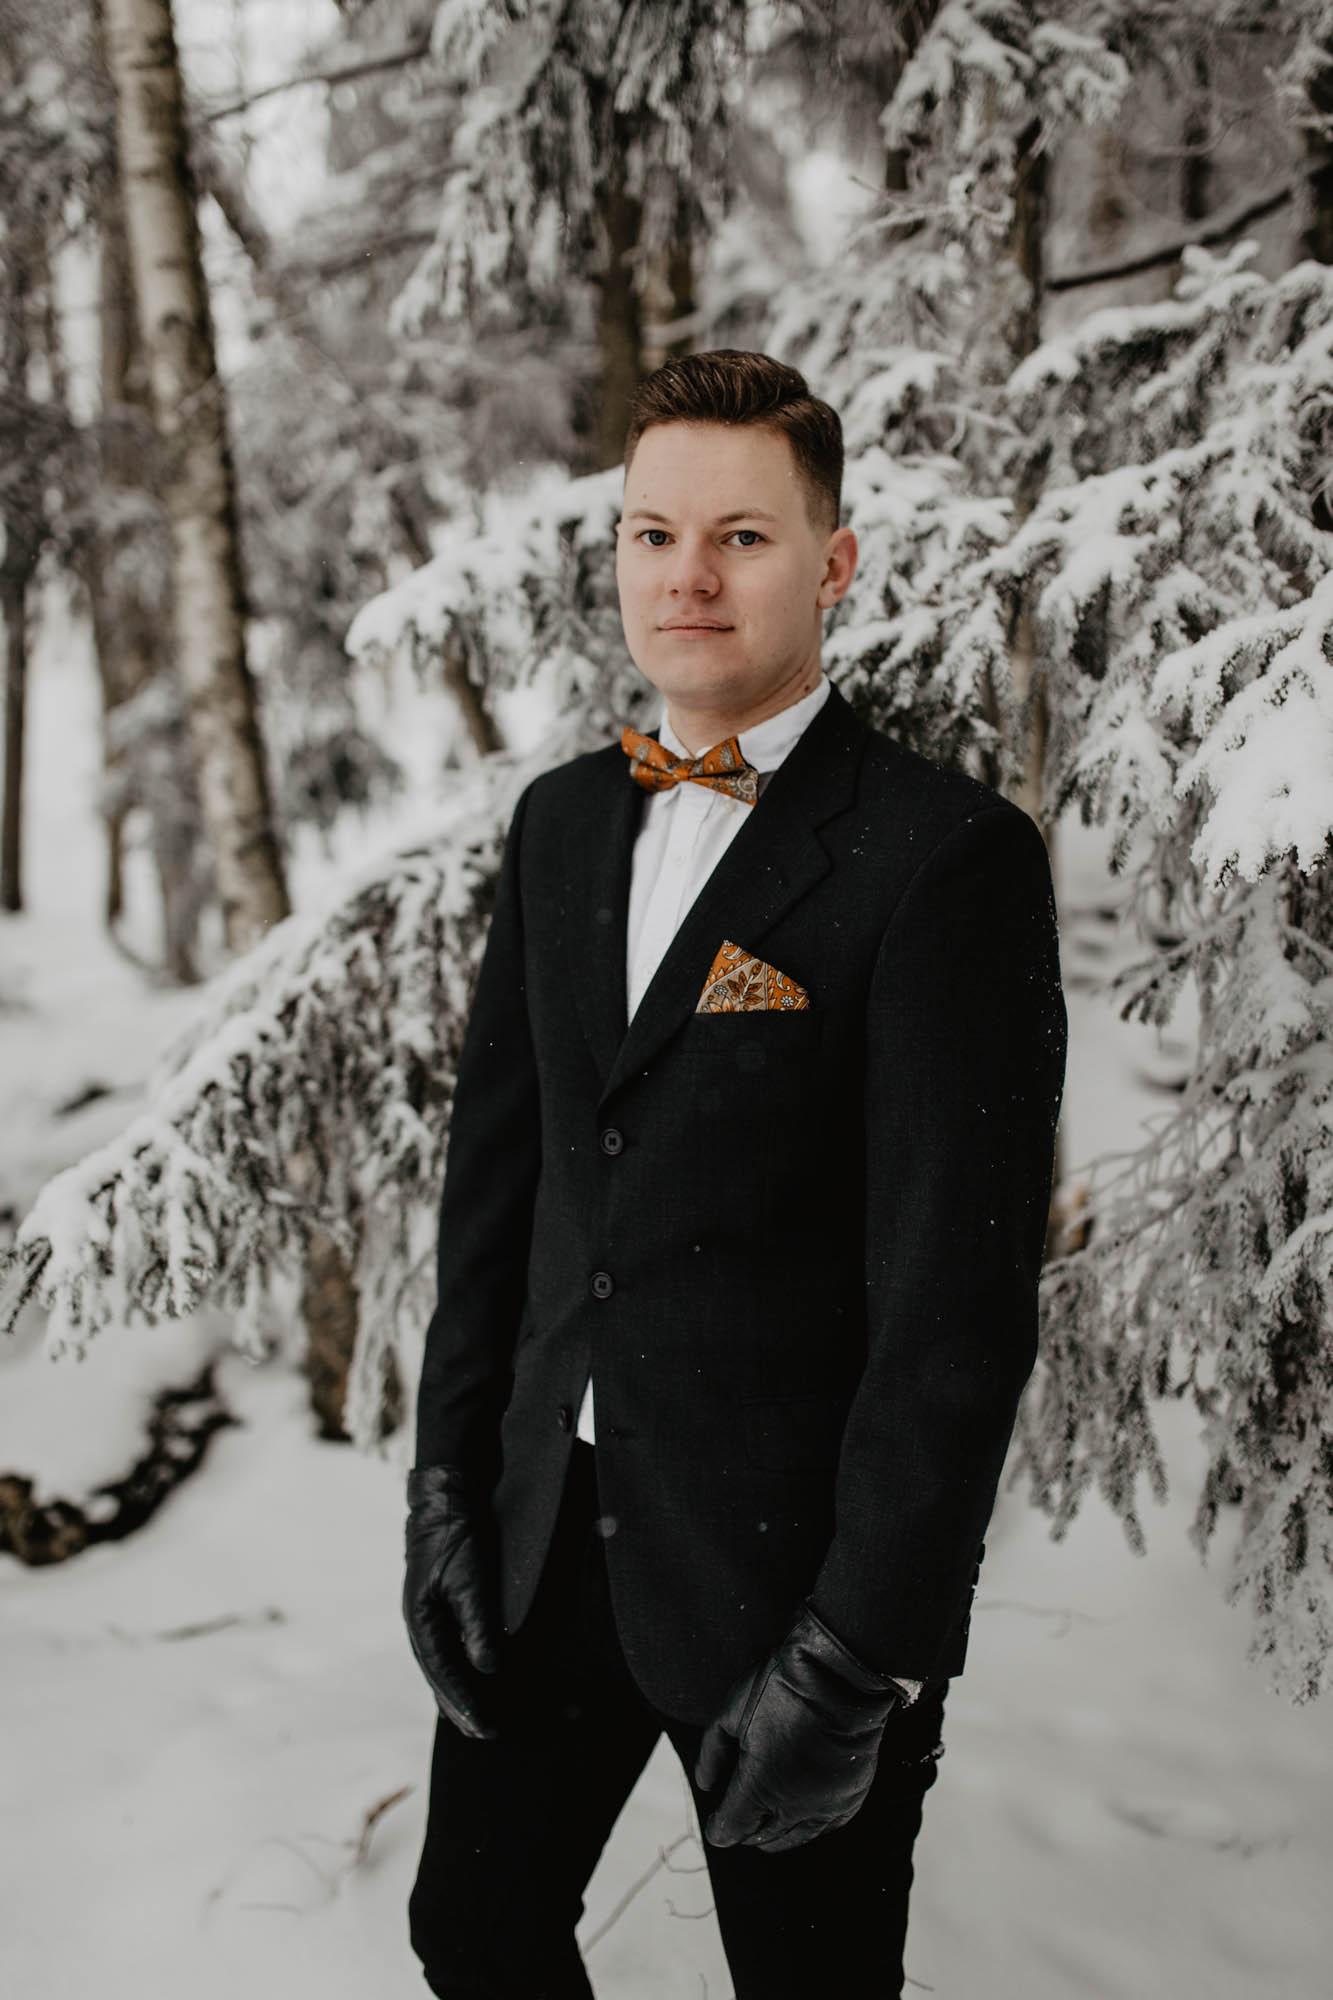 ashley_schulman_photography-winter_wedding_tampere-26.jpg